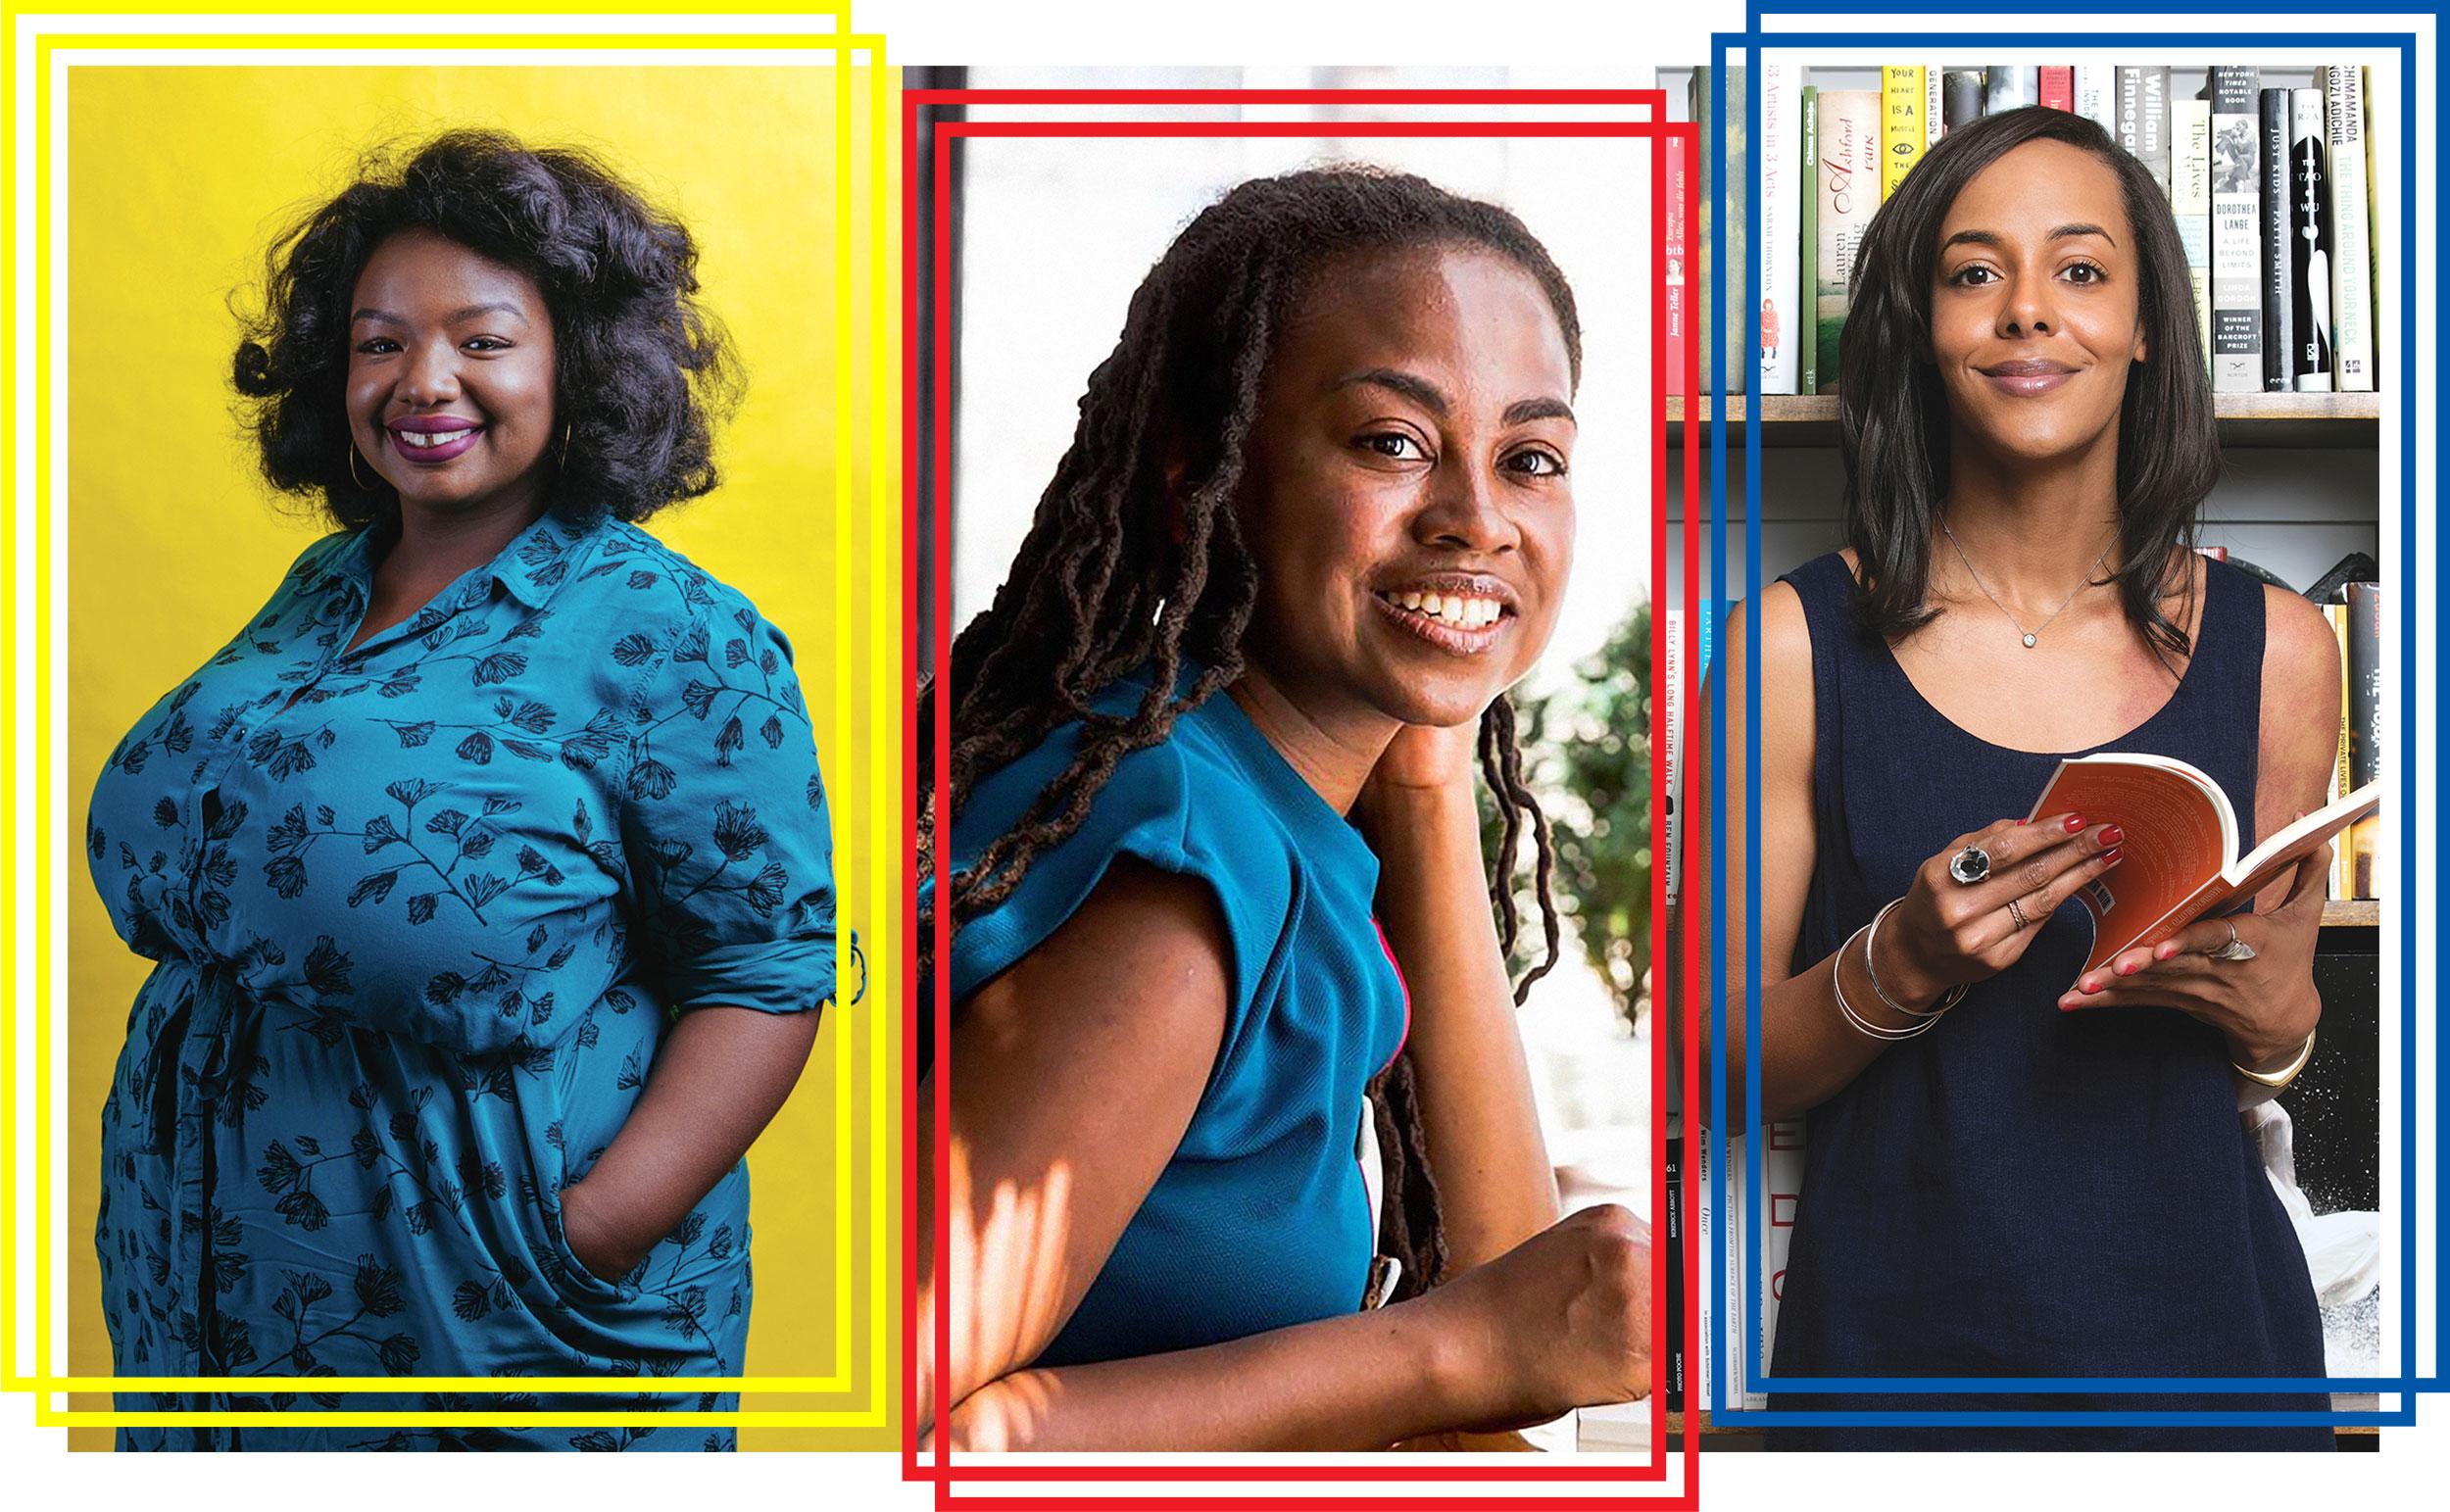 Portraits of three prominent Black women in publishing: Kima Jones, Jamia Wilson, and Lisa Lucas